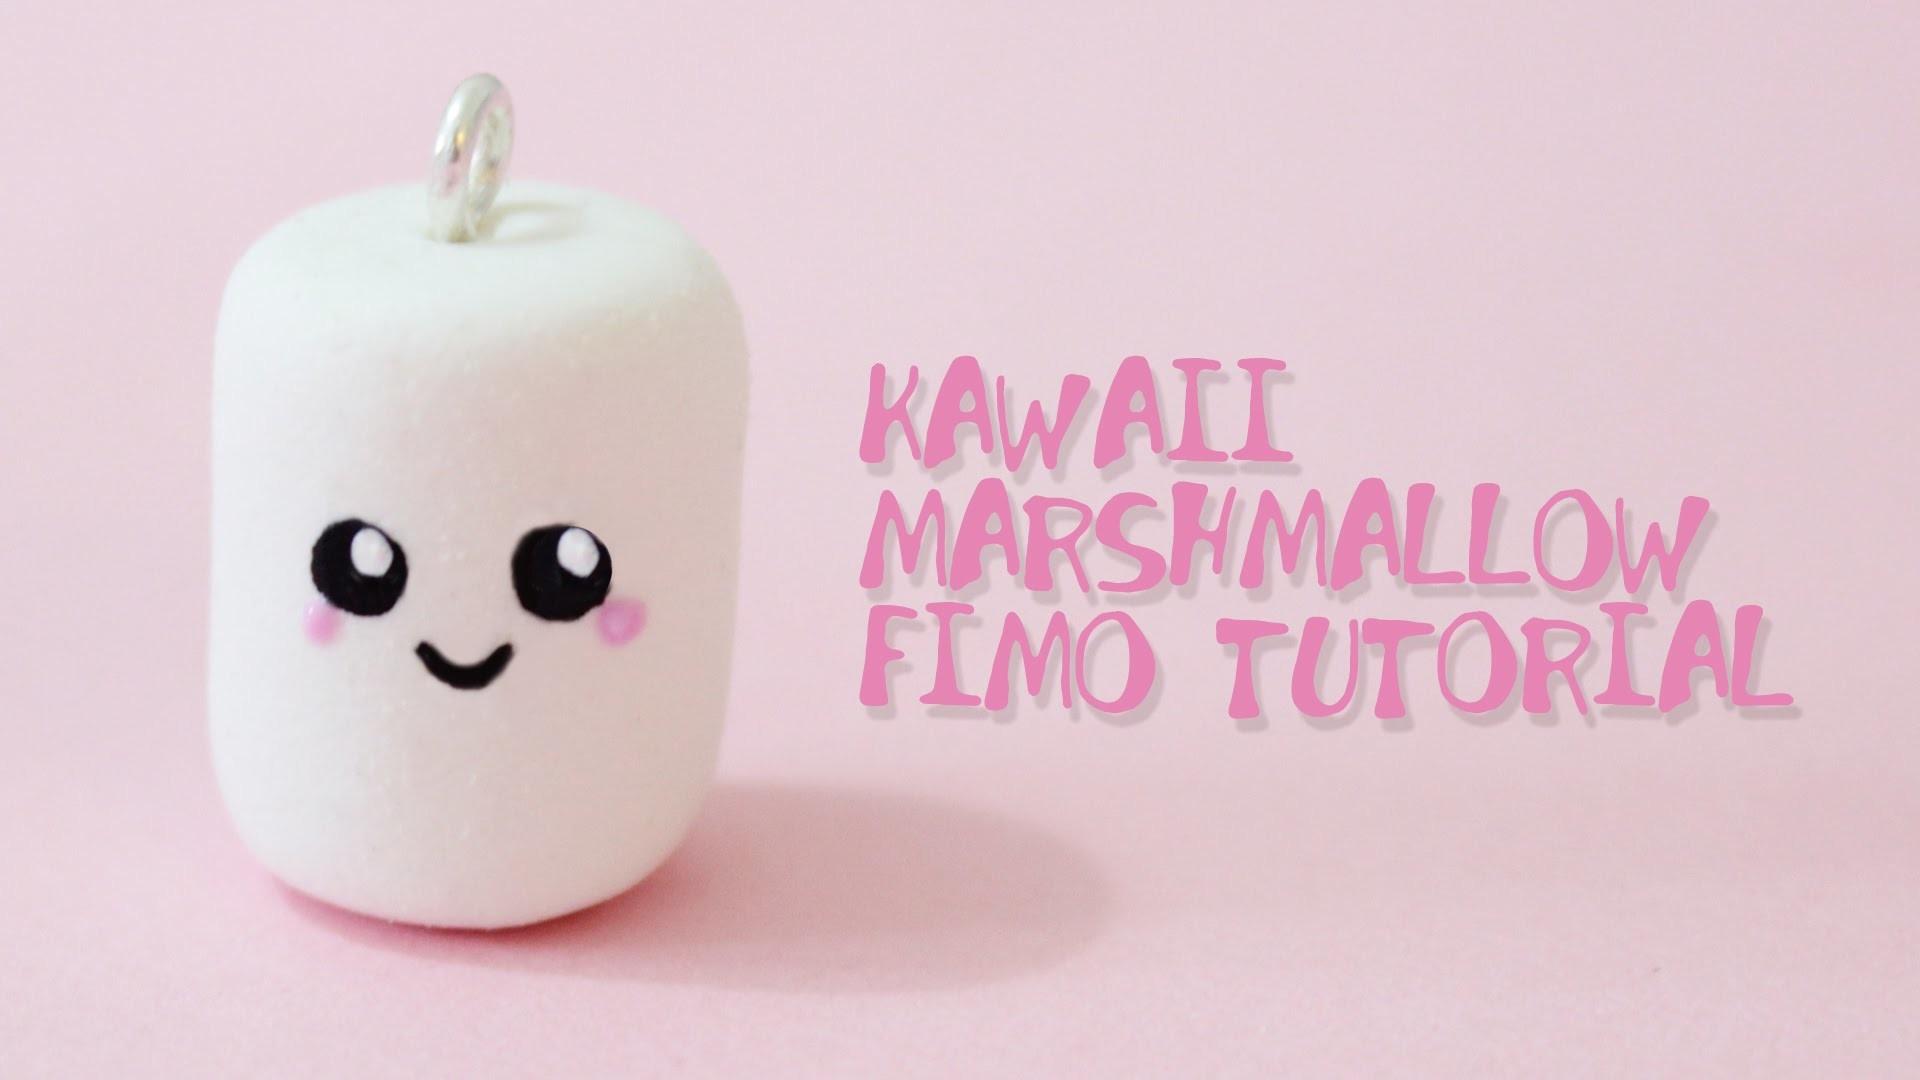 [Fimo Friday] Kawaii Marshmallow Fimo Tutorial. Kawaii Marshmallow polymer clay   Anielas Fimo